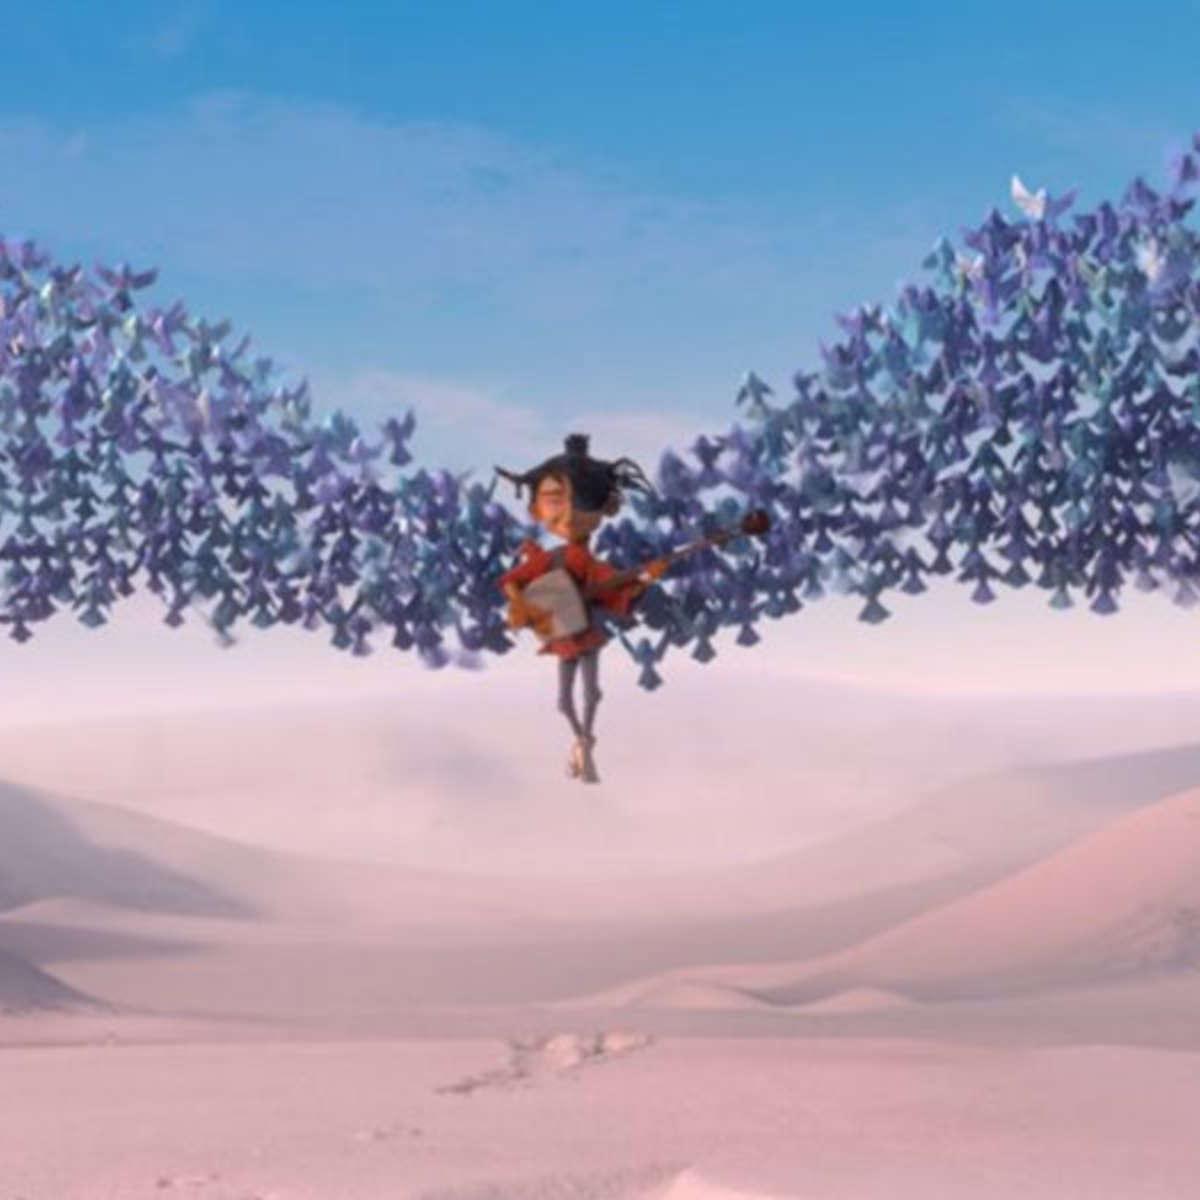 kubo-two-strings-movie-trailer-laika.jpg